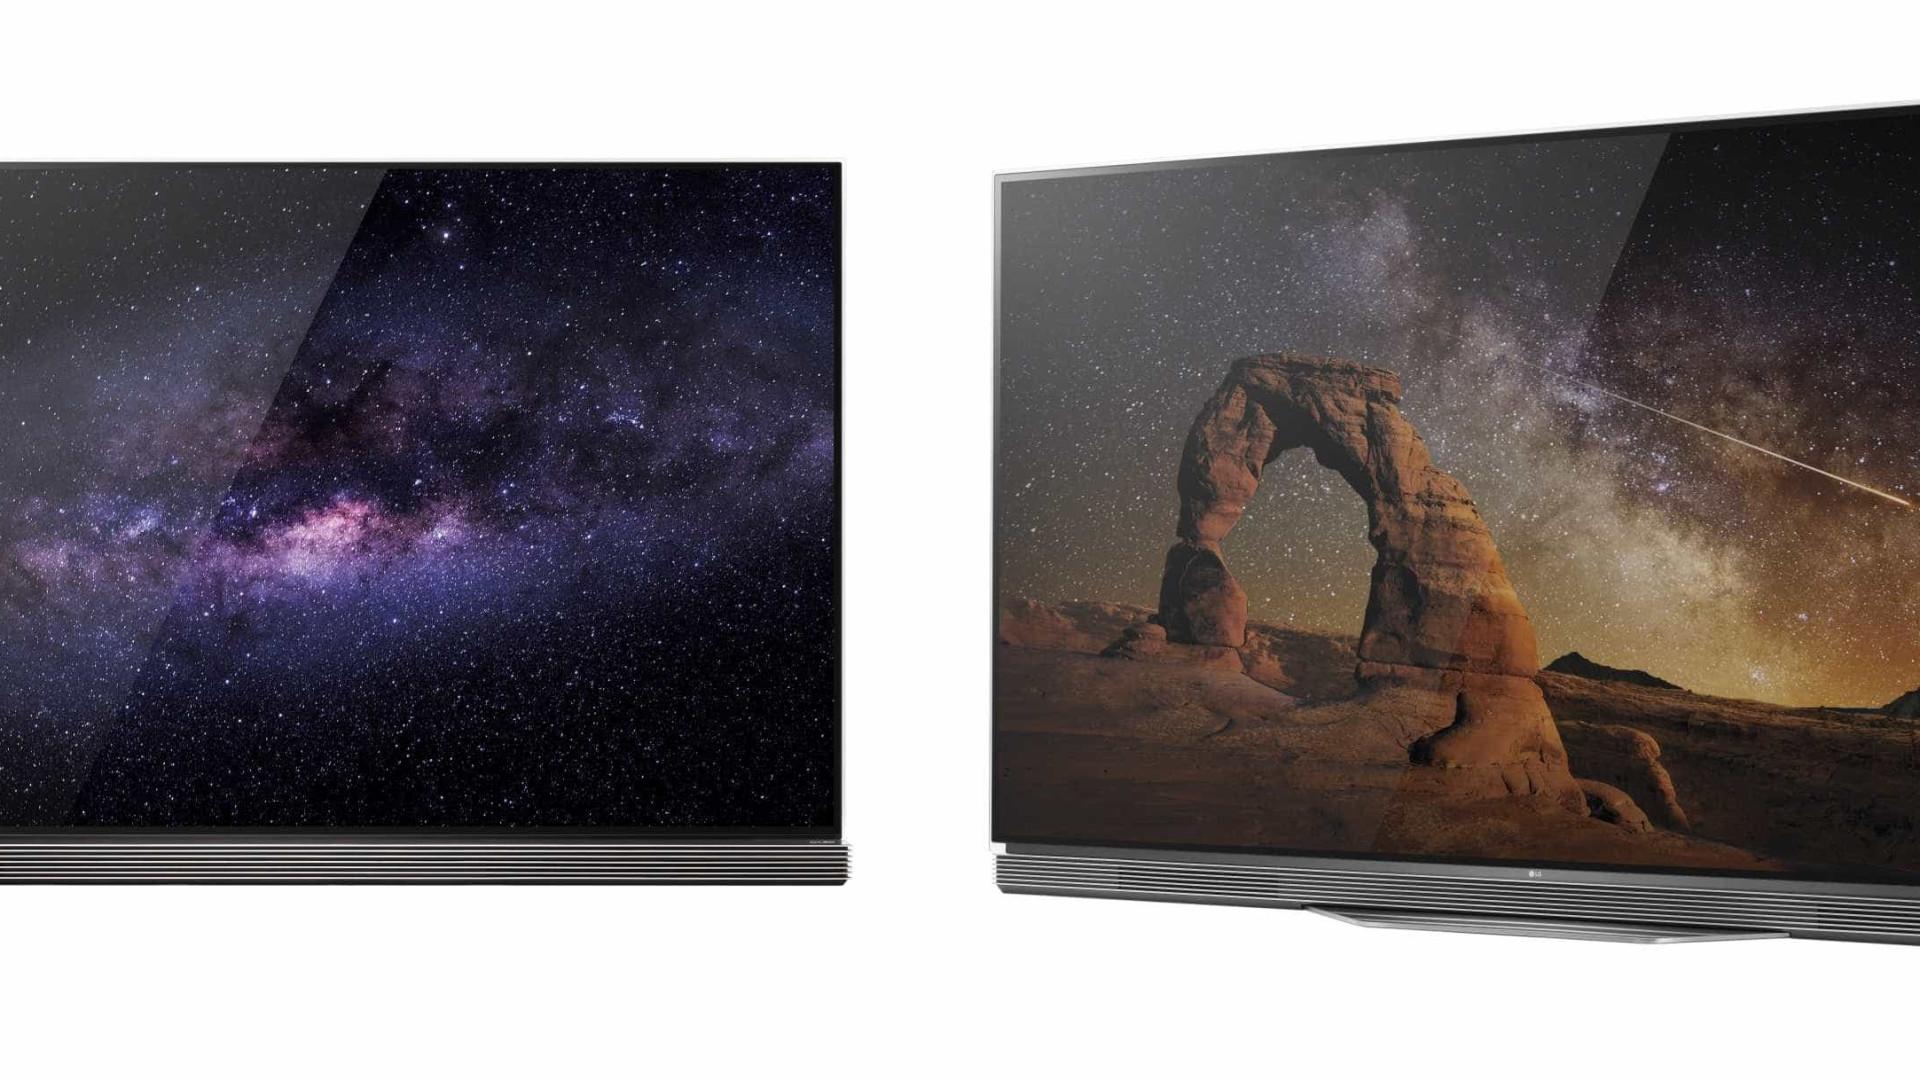 LG apresenta novas televisões 4K OLED